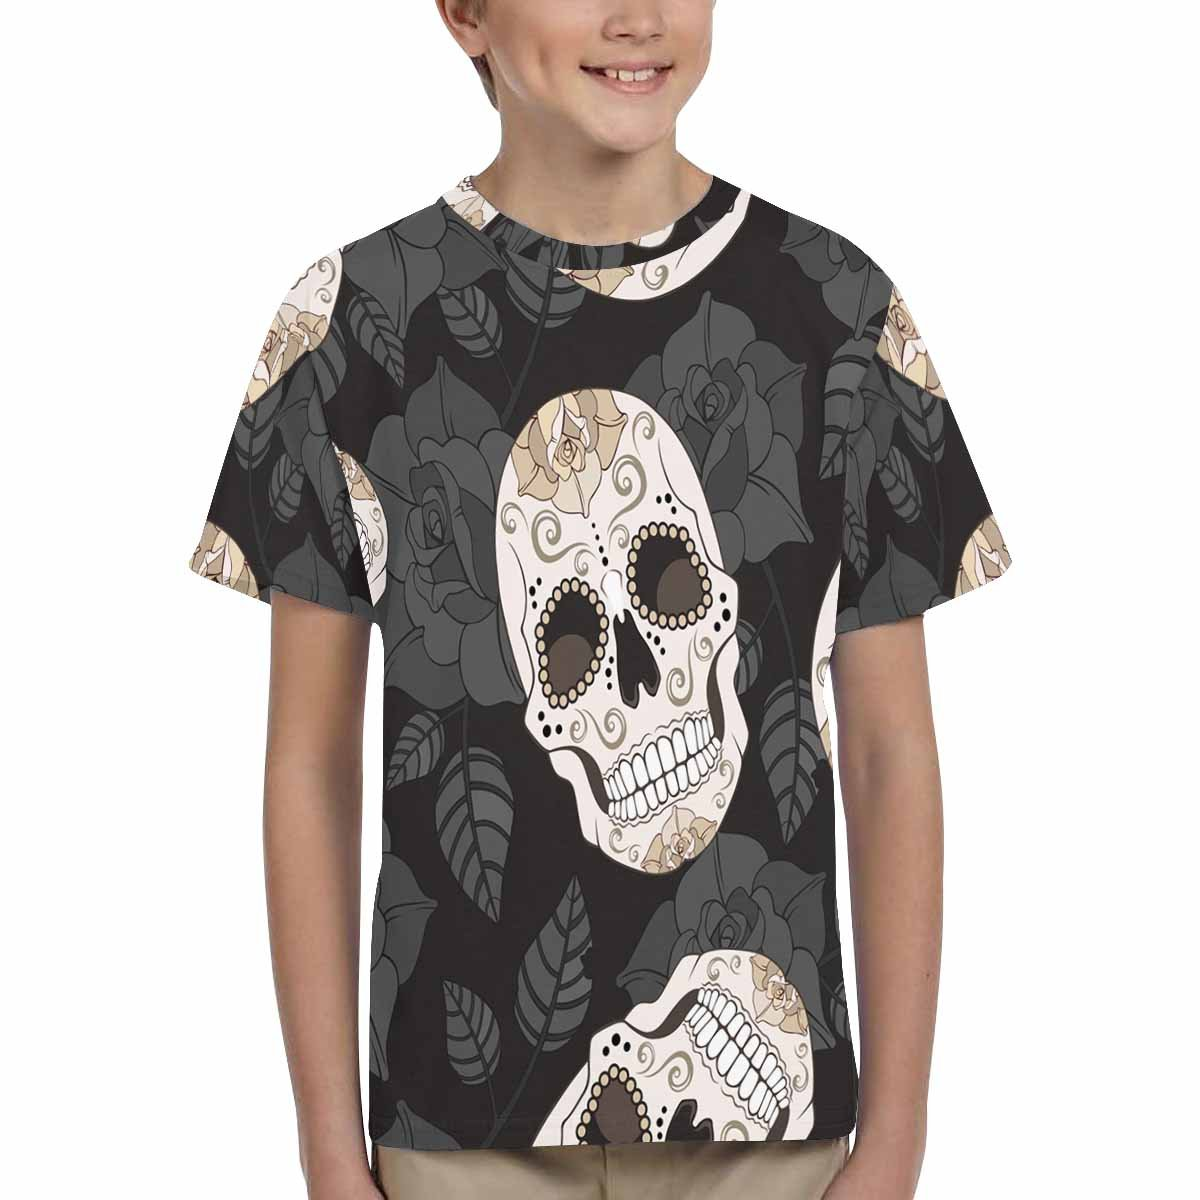 INTERESTPRINT Kids T-Shirts Roses and Sugar Skulls XS-XL